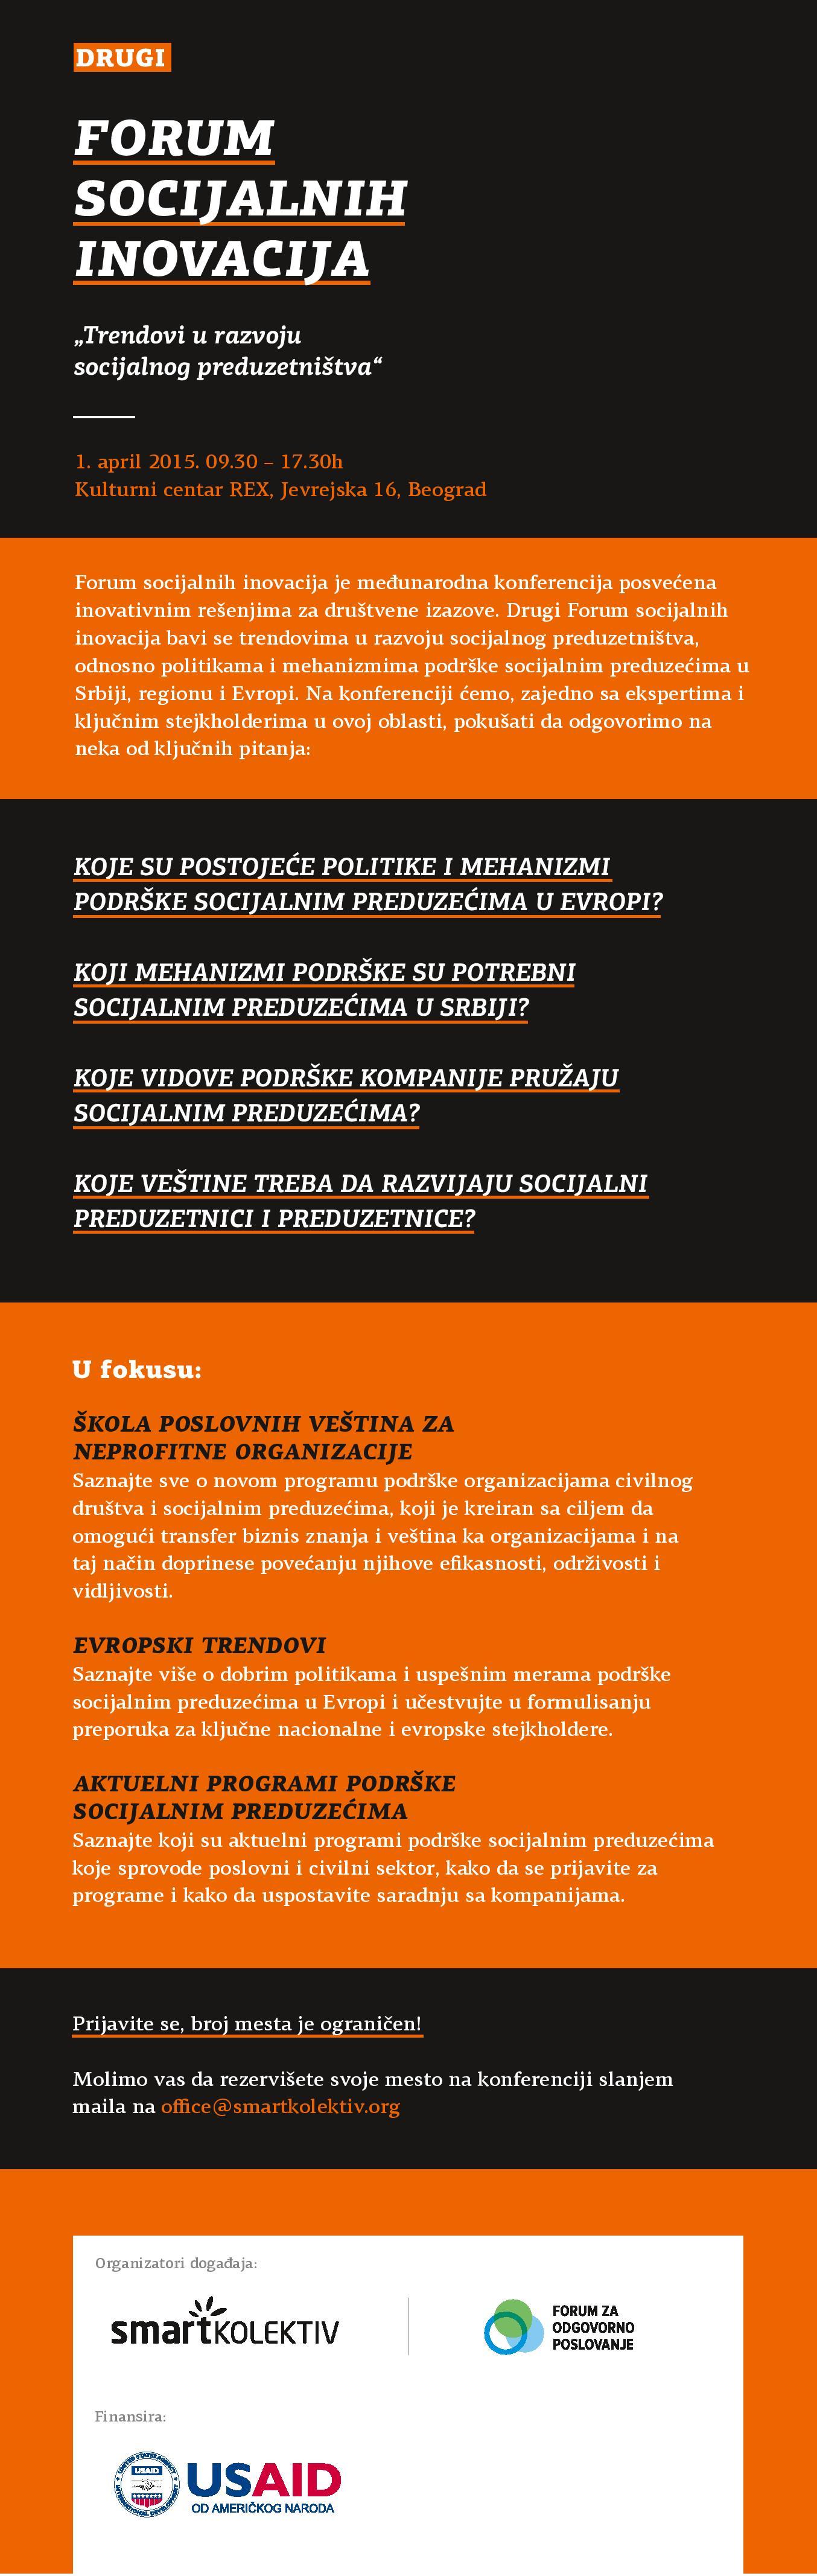 Pozivnica650-px_SIF_2015-page-001